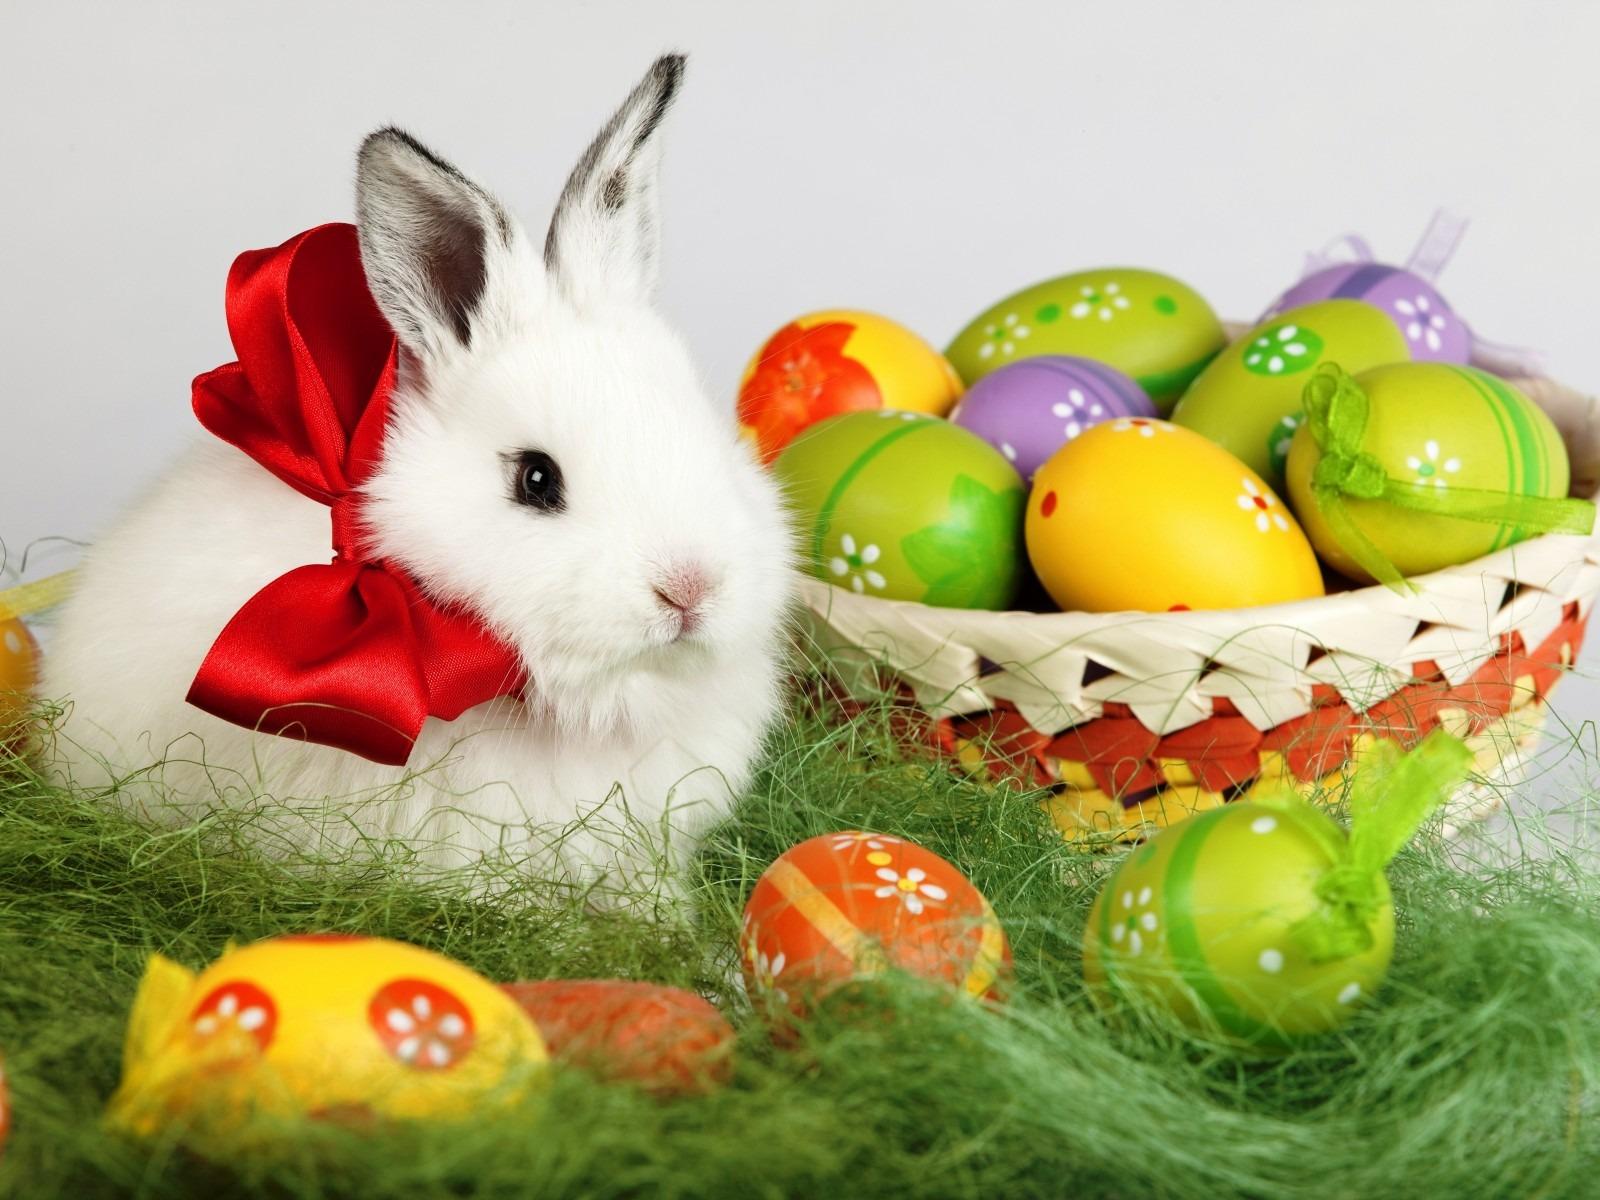 free desktop wallpaper easter bunny MEMEs 1600x1200